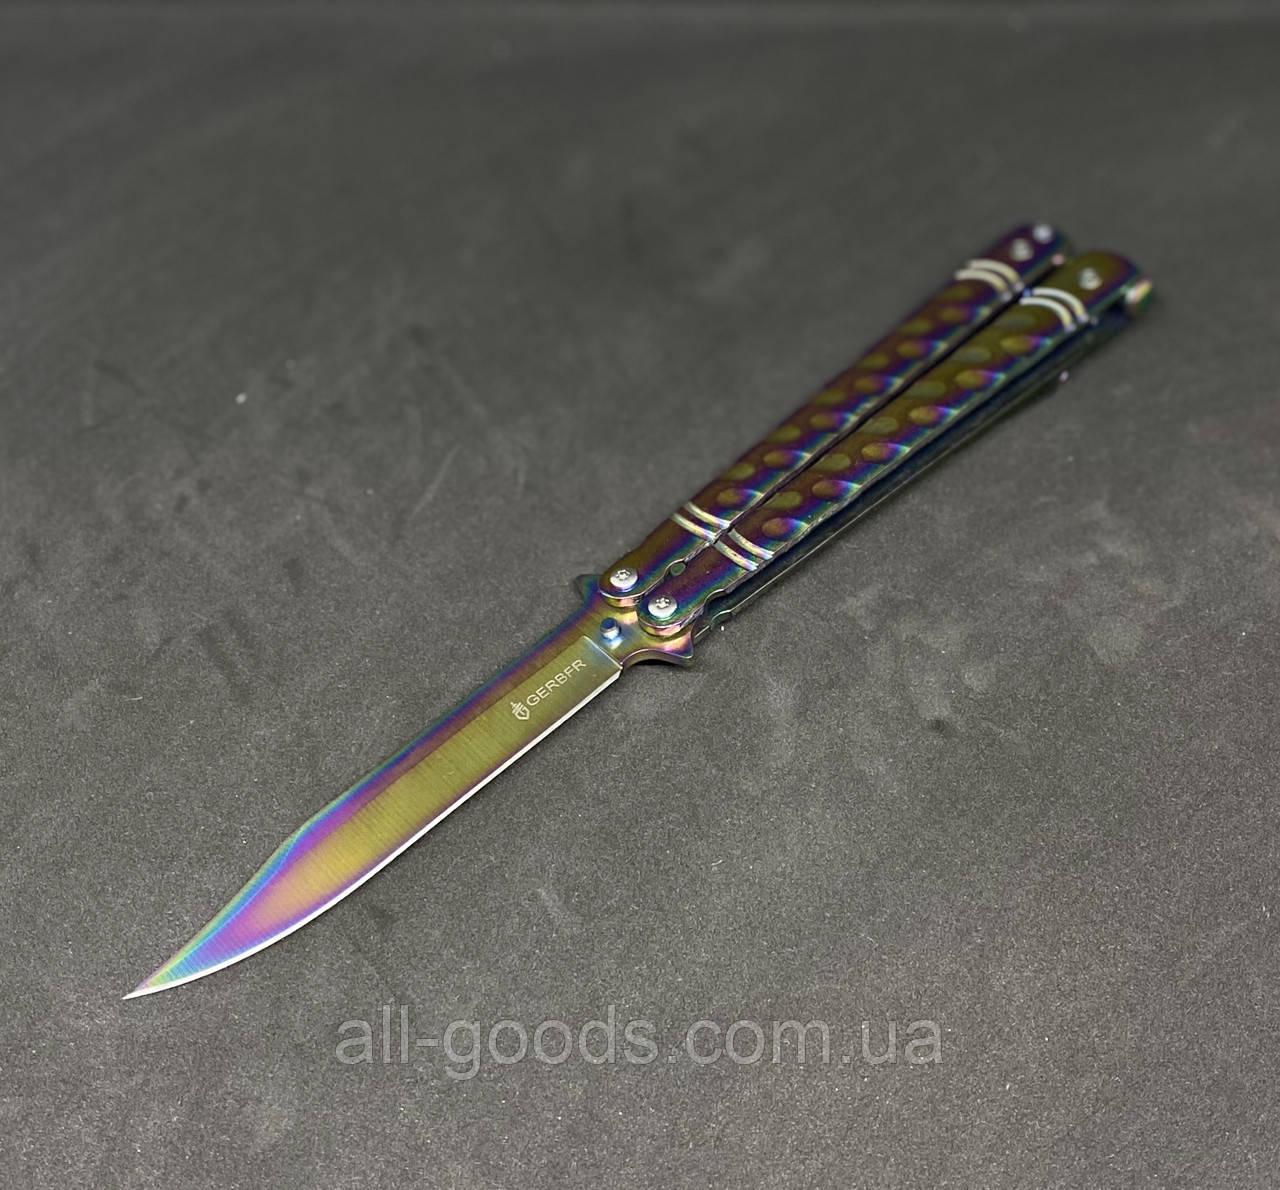 Нож бабочка или балисонг GERBFR 22 см АК-53 градиент. Нож-бабочка. Складной нож.